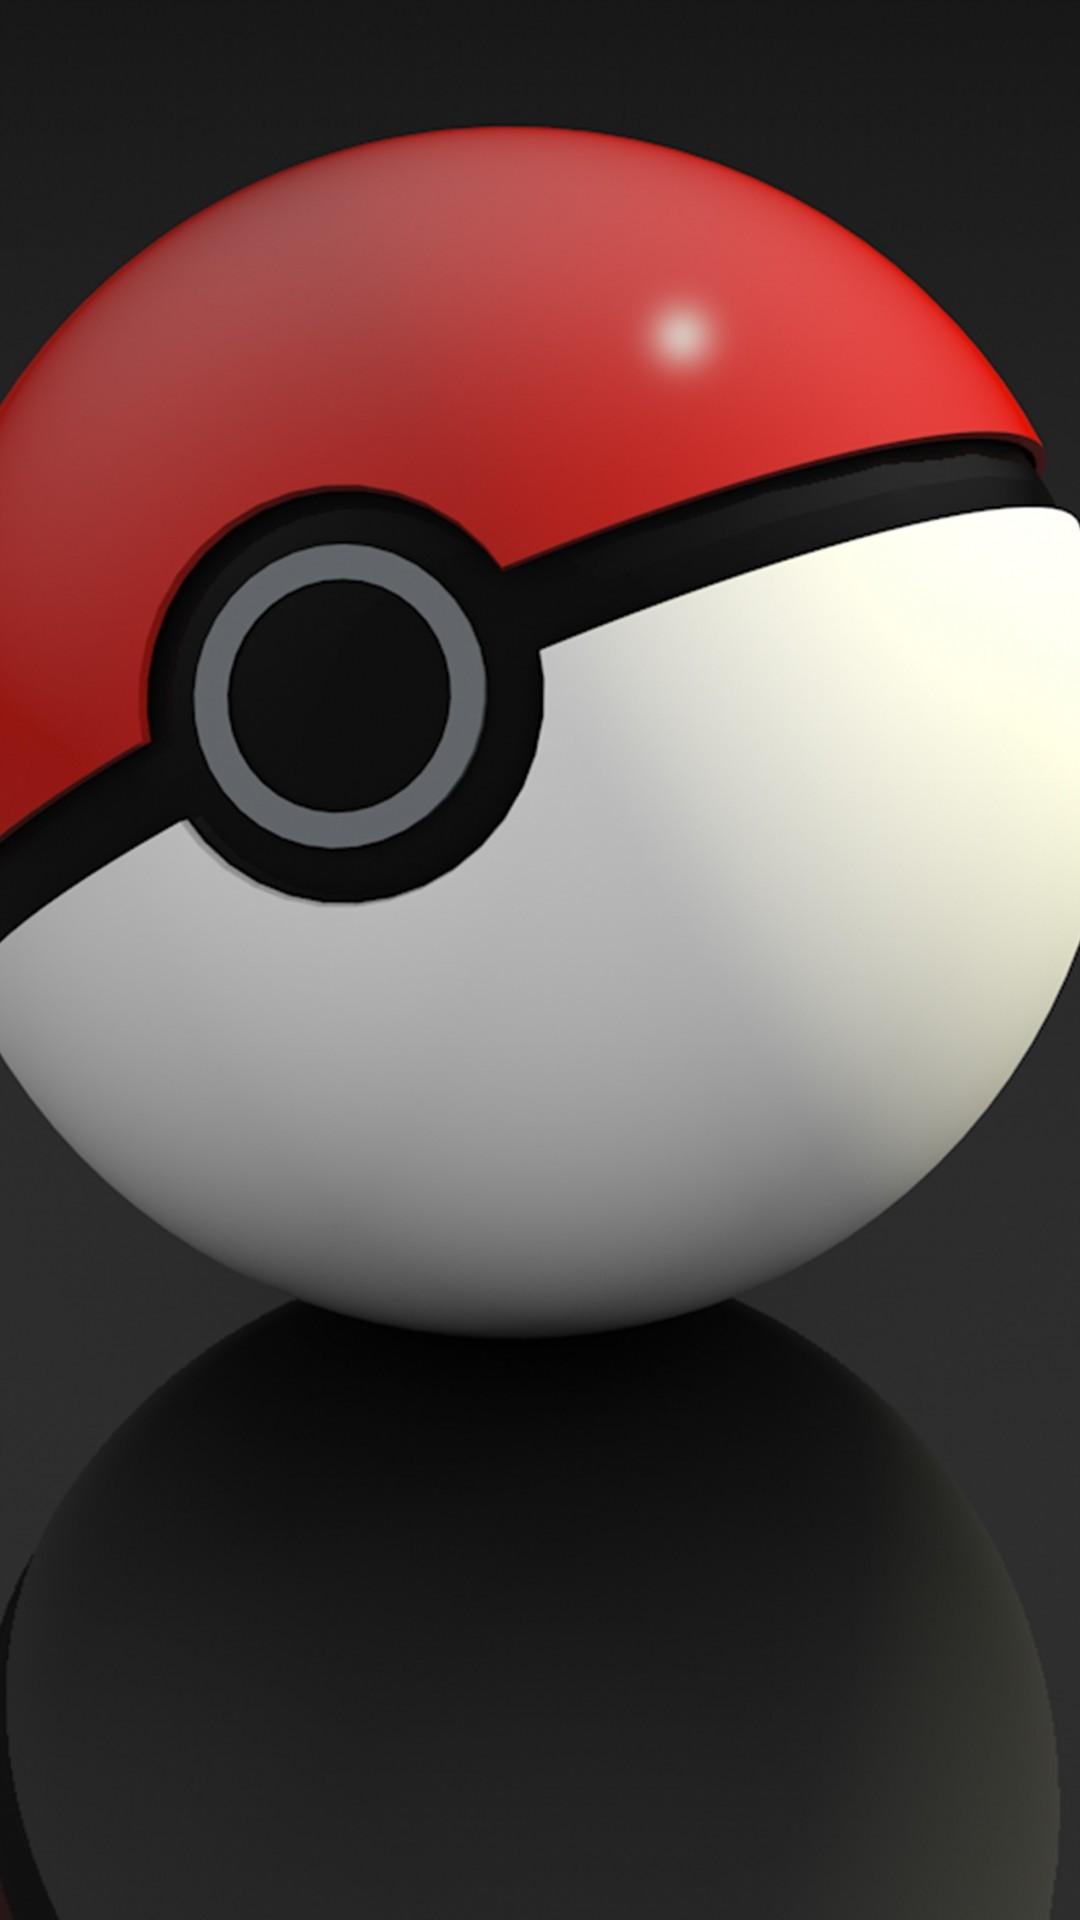 Pokemon, Pokeball